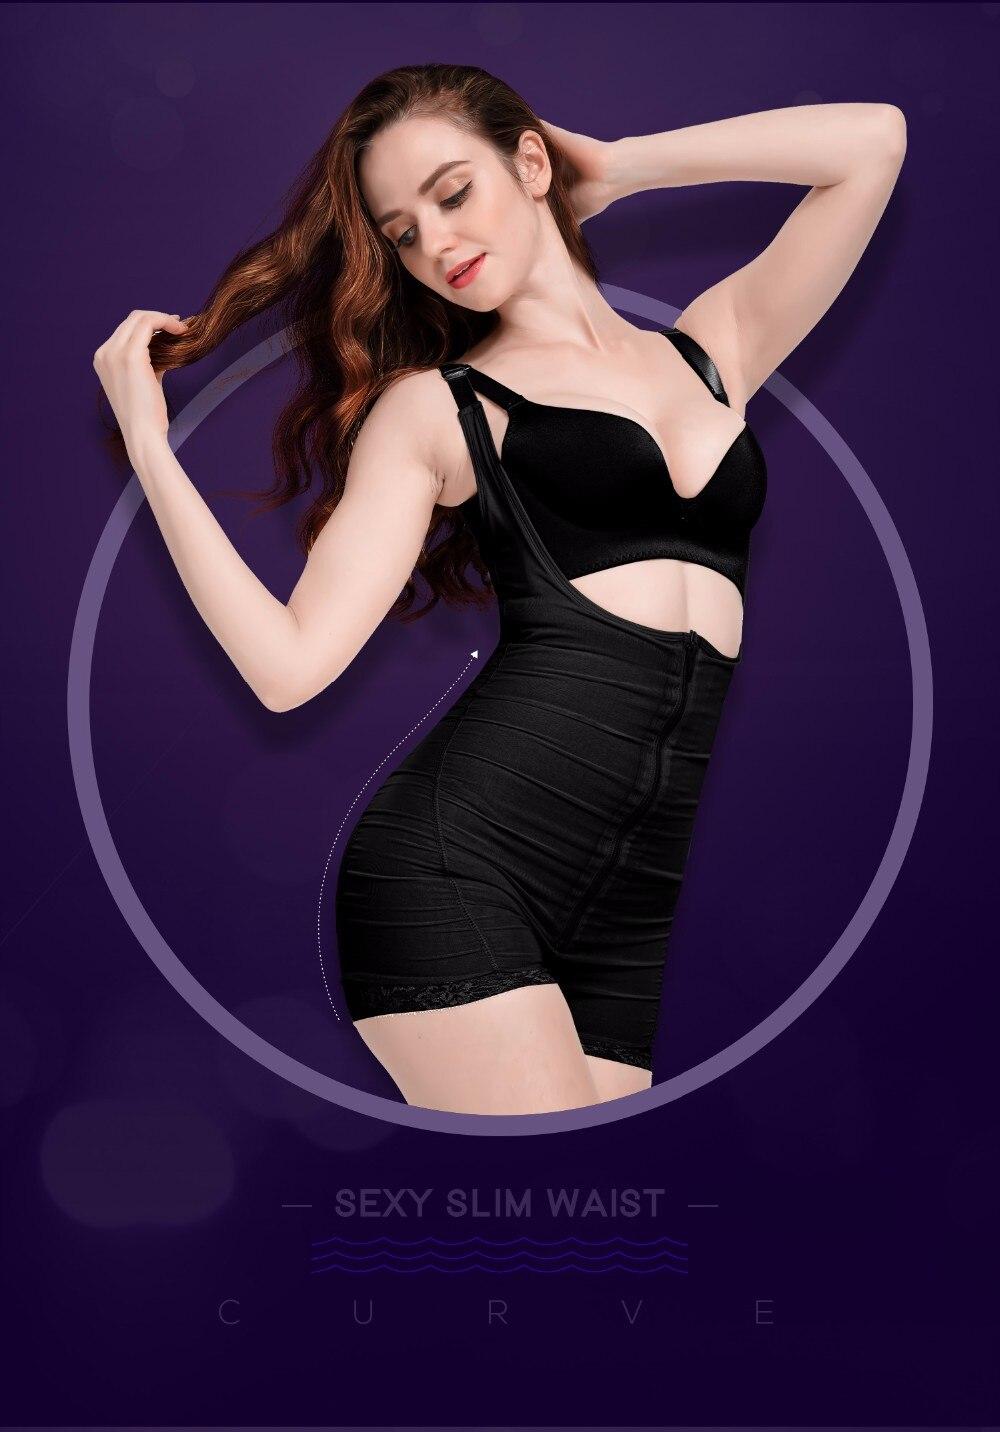 Slimming Underwear bodysuit Women Lingerie hot Shaper Slimming Building Underwear Ladies Shapewear Body Shaping modeling strap